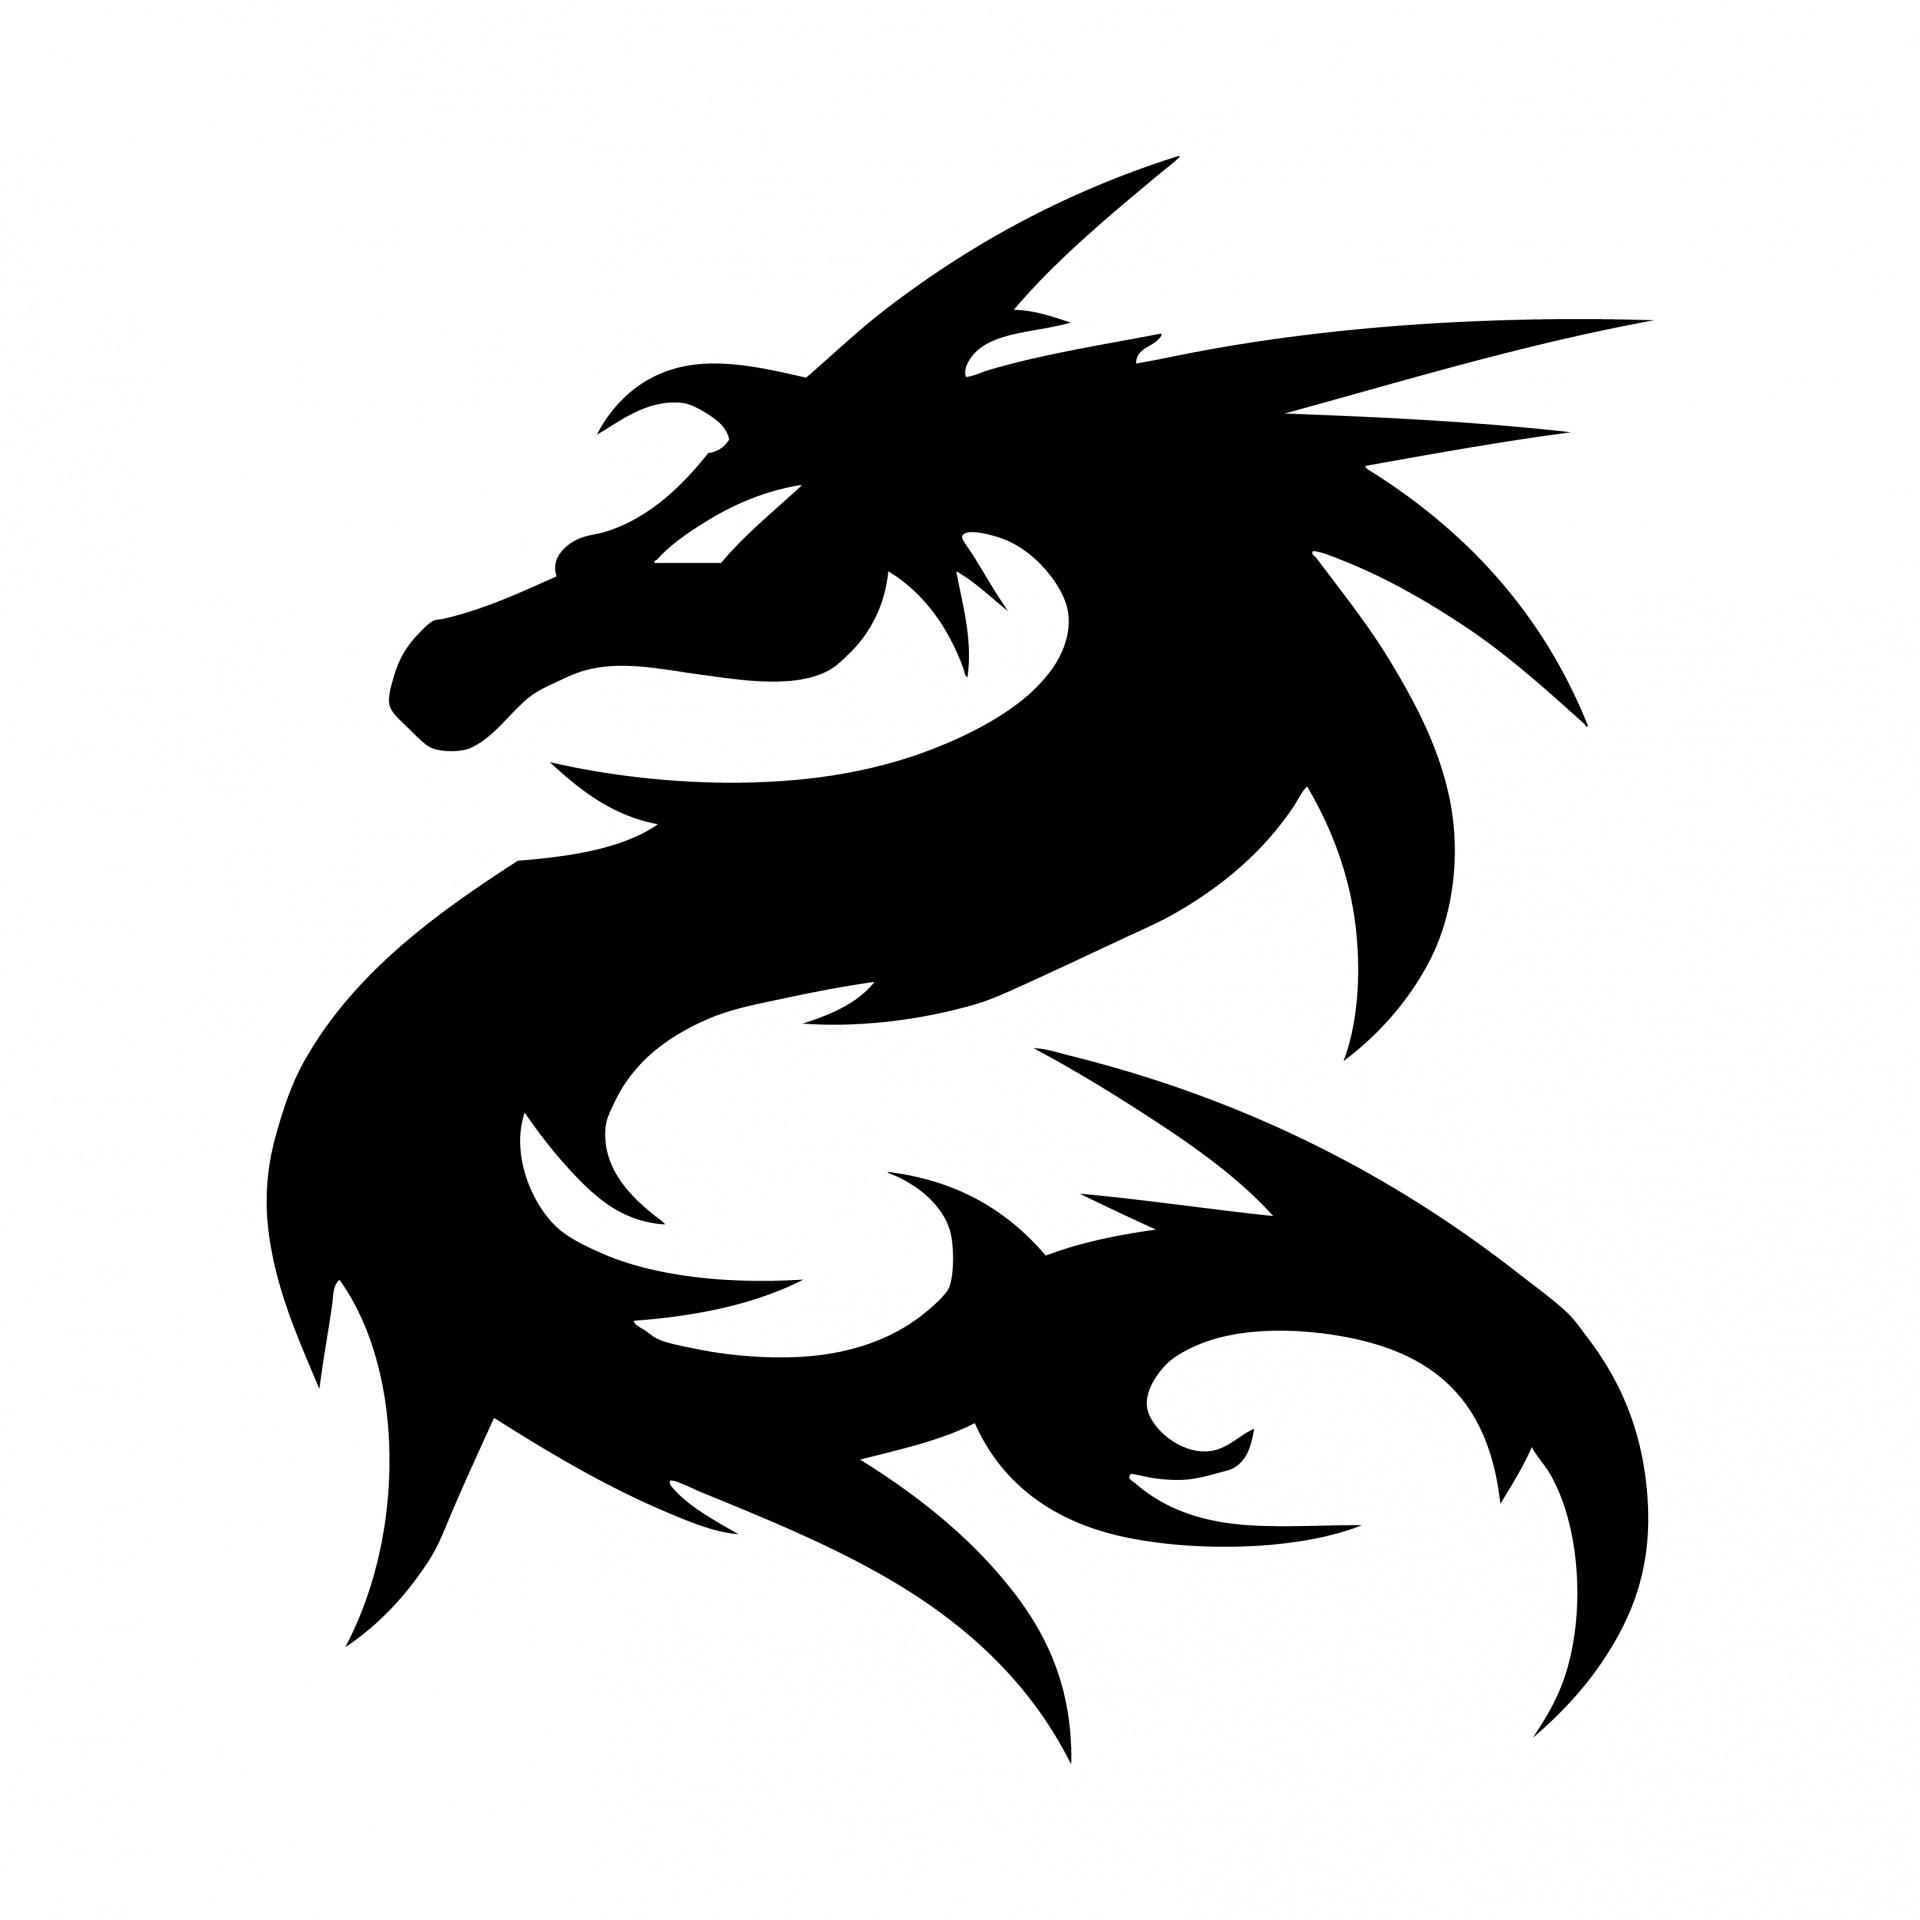 Dragon logo symbol silhouette